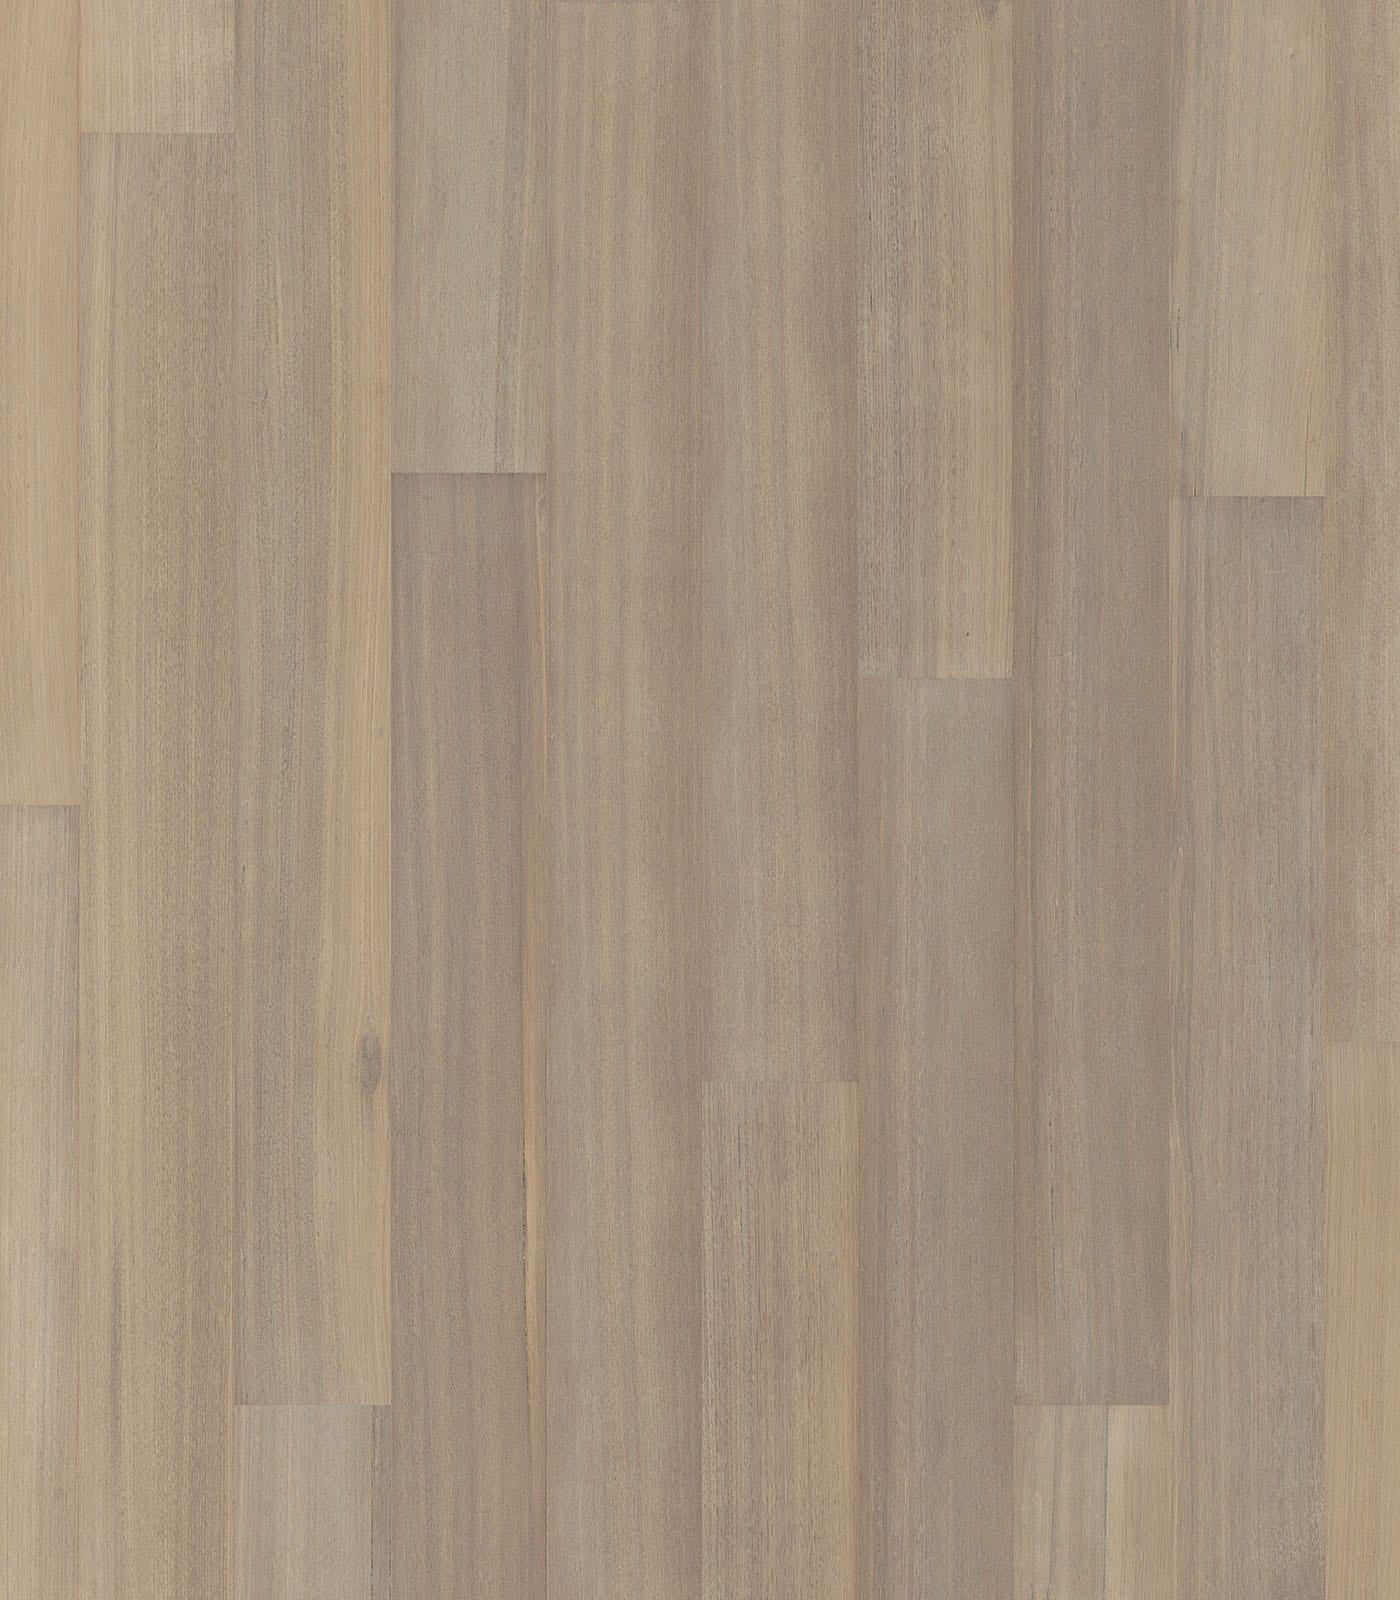 Sydney-Tasmanian Oak floors-After Oak Collection